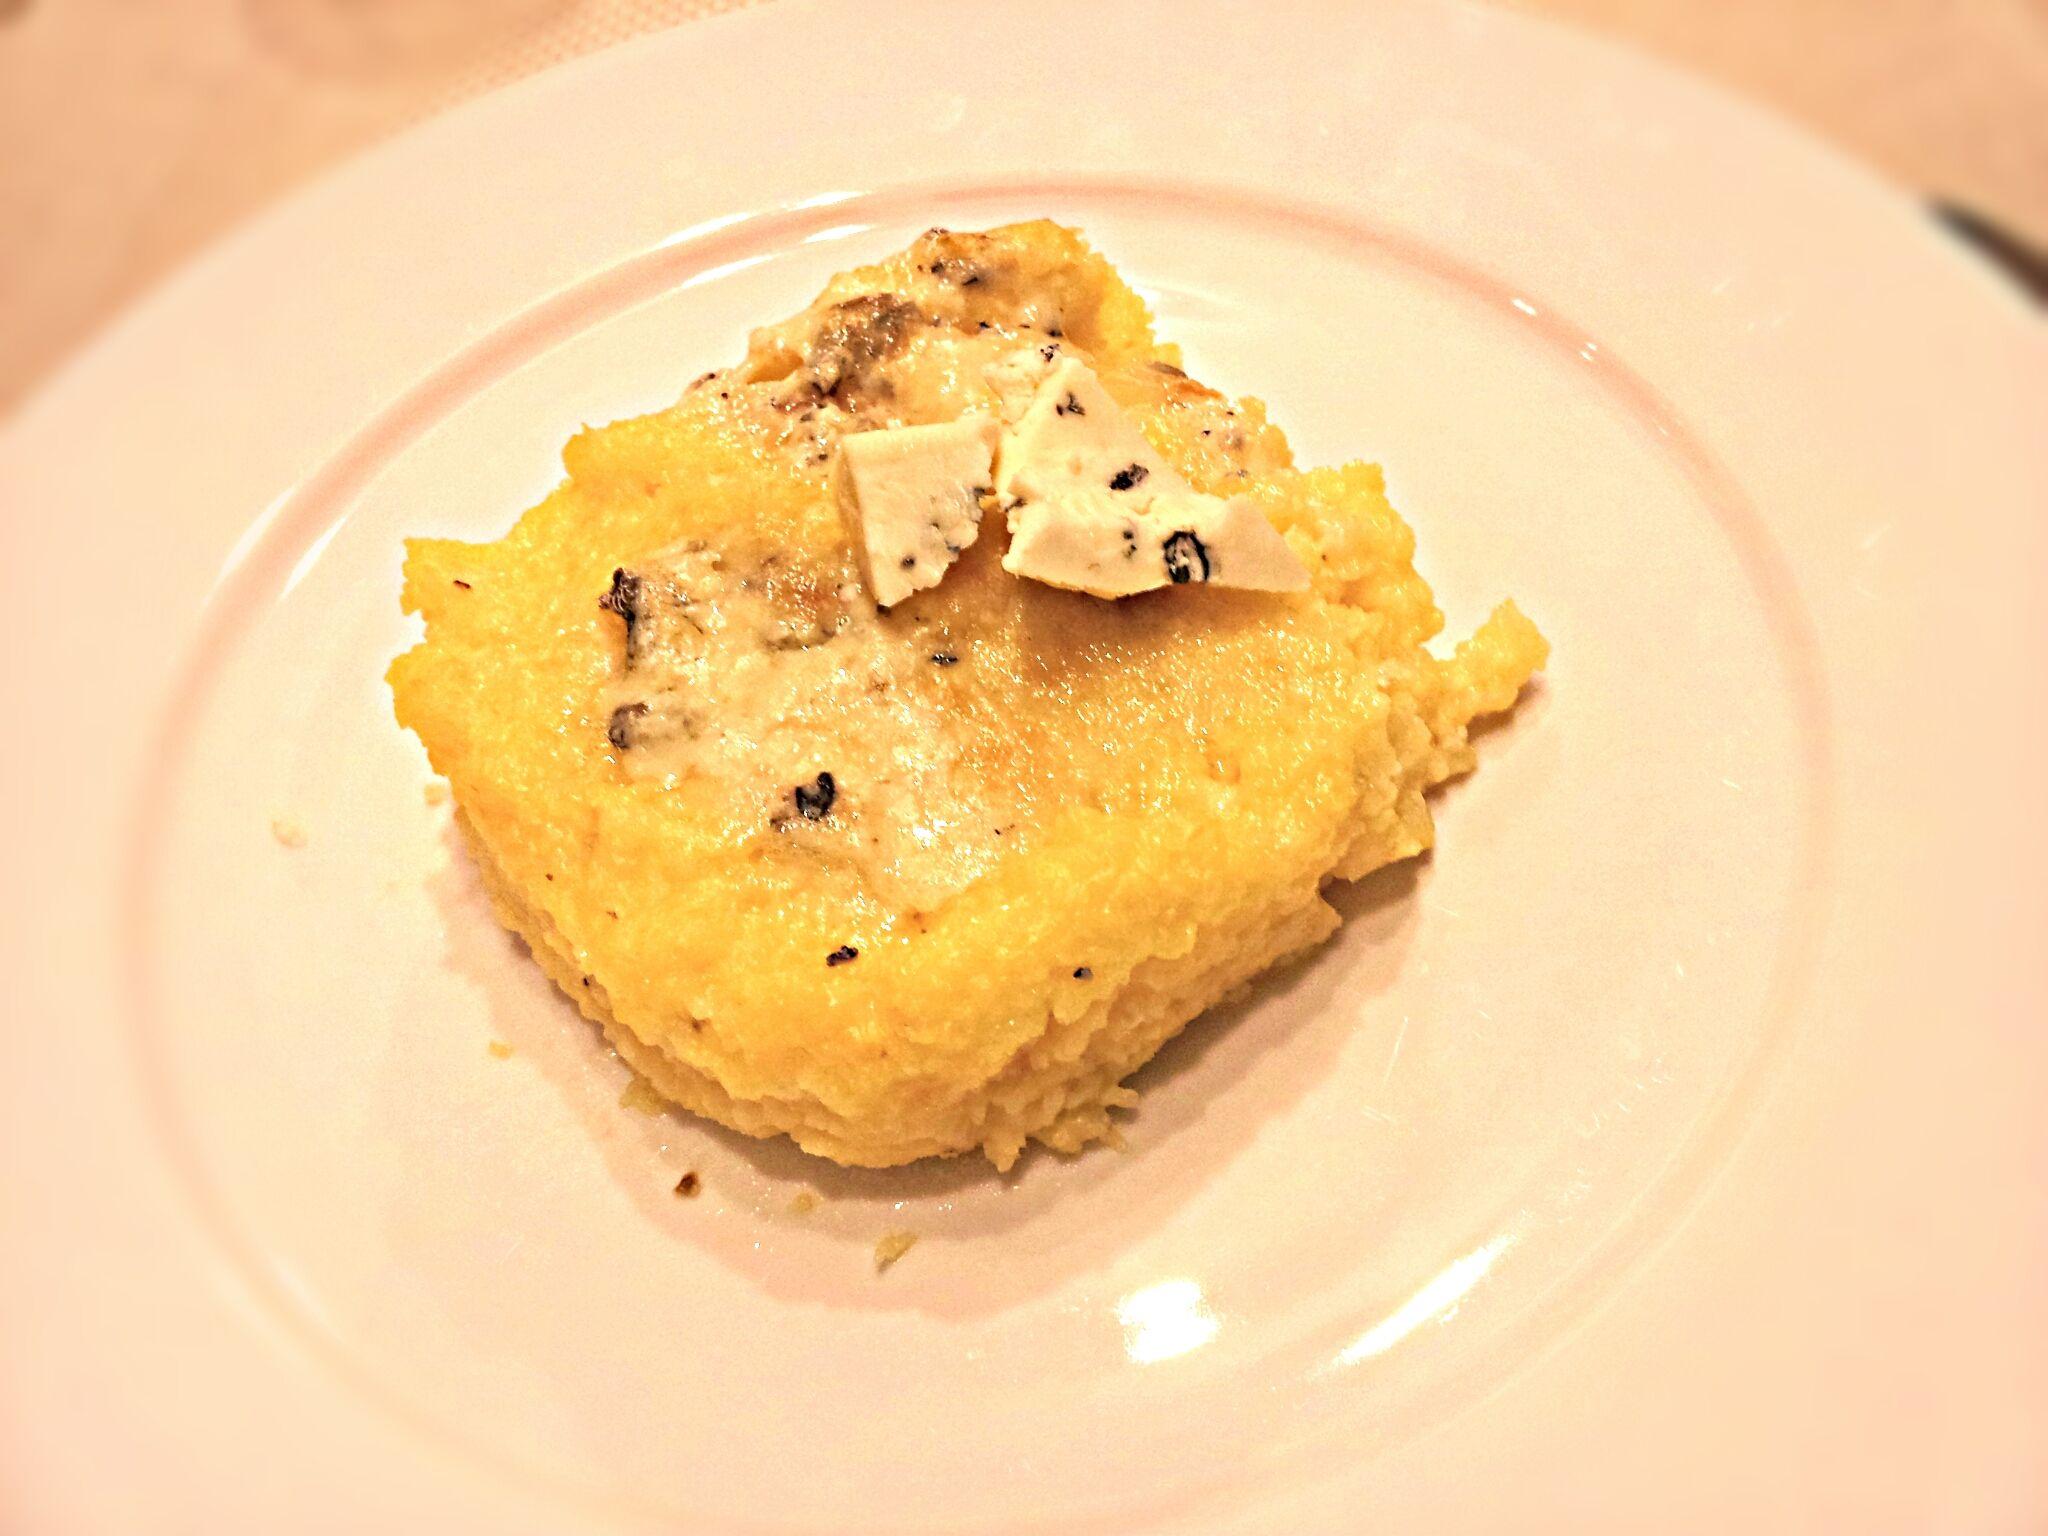 Polenta con il Gorgonzola in Pentola a Pressione (Baked Gorgonzola Polenta)